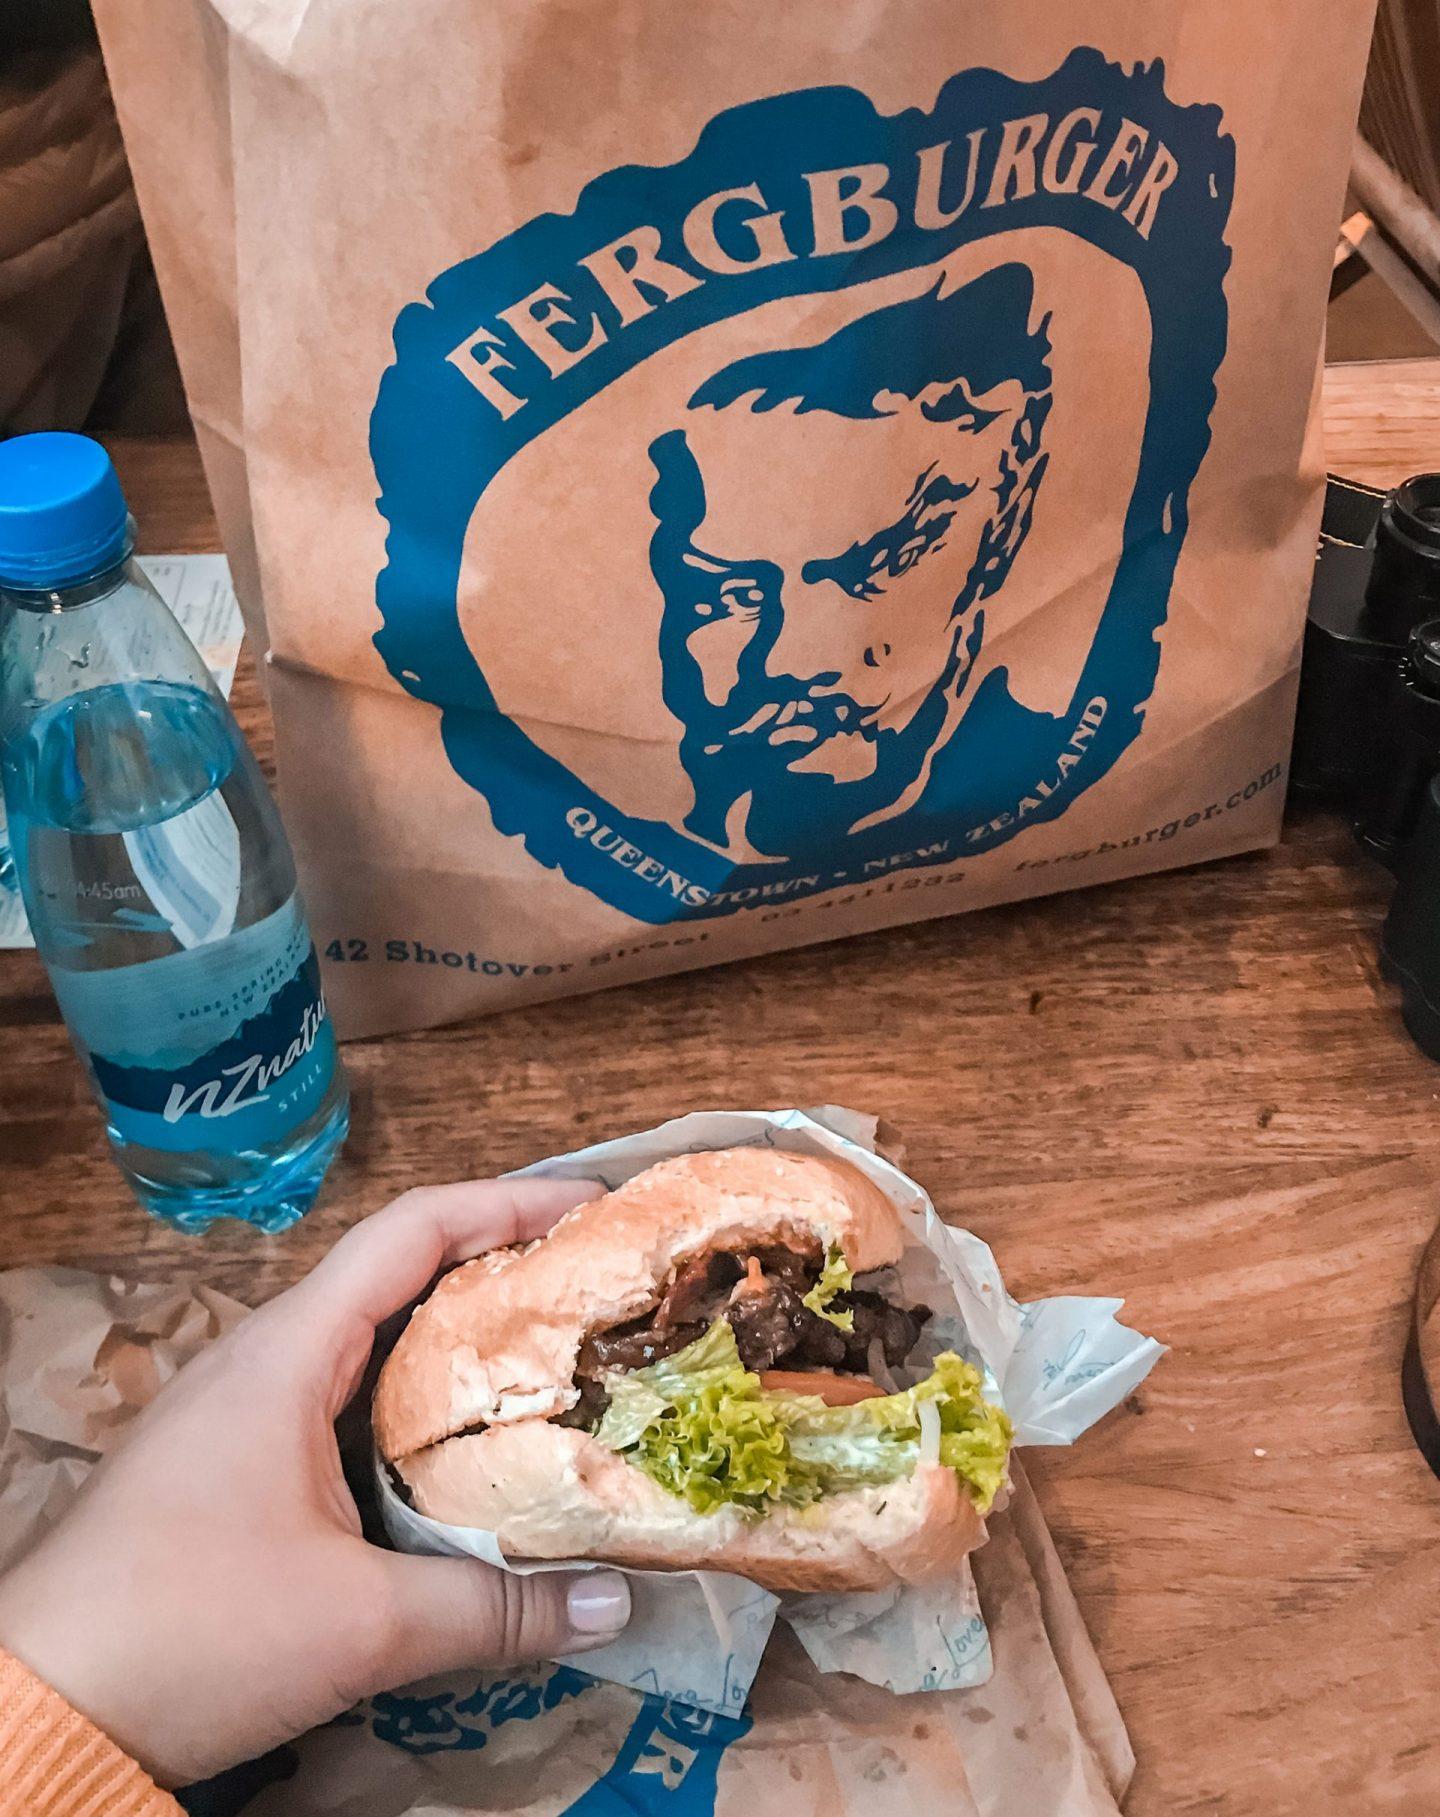 Fergburger, Queenstown, Nova Zelandija - najboljši burger na svetu